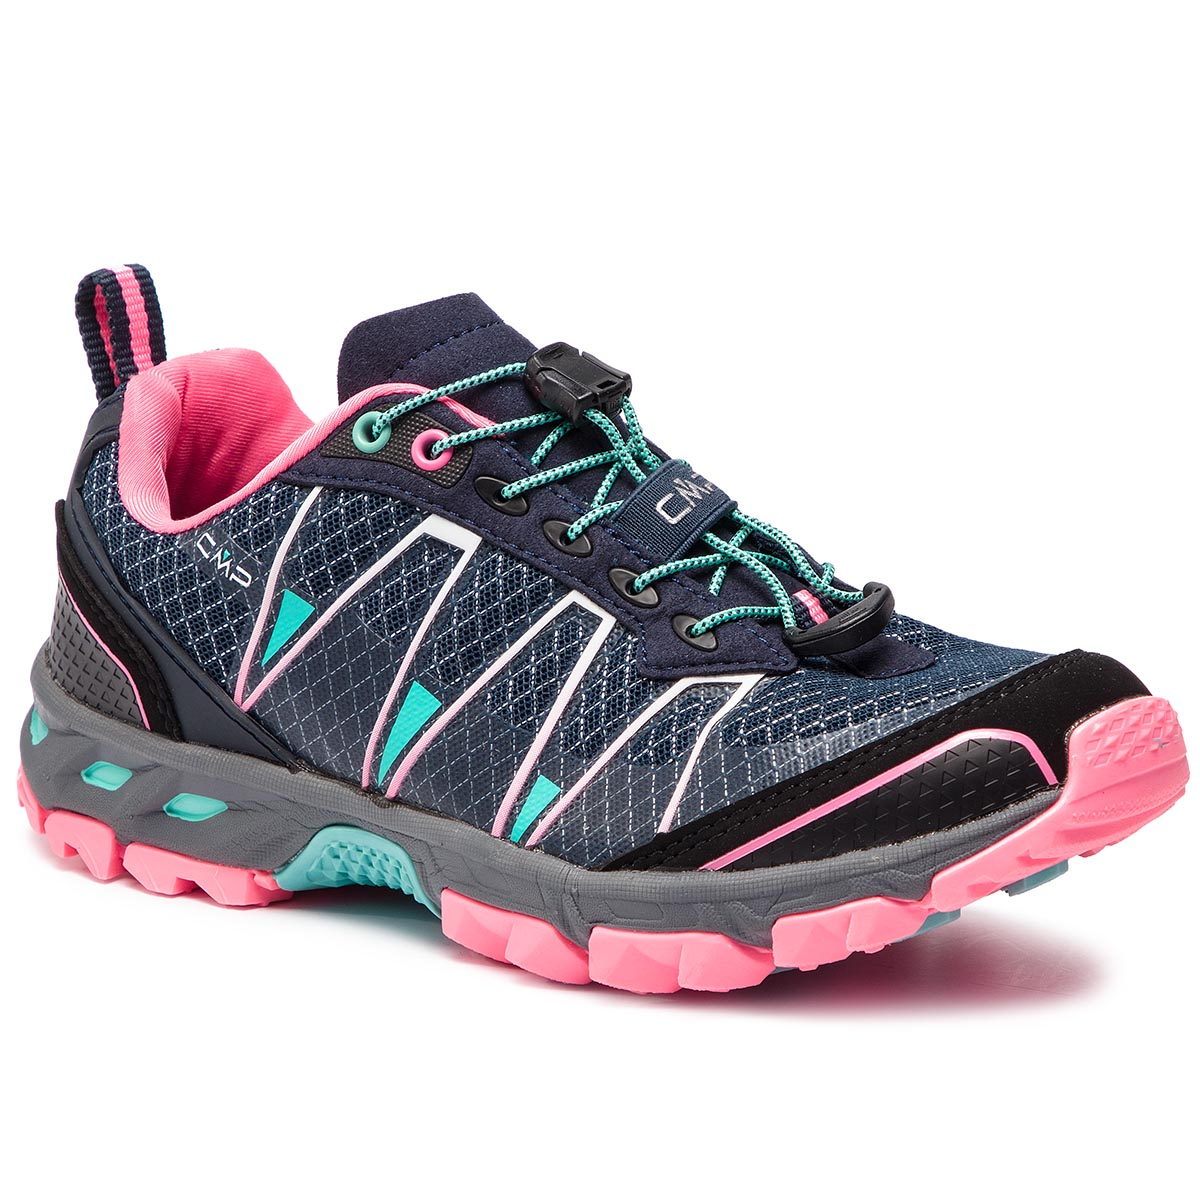 3bfc2968efd Μποτάκια πεζοπορίας CMP - Altak Wmn Trail Shoes 3Q95266 Navy/Pink ...